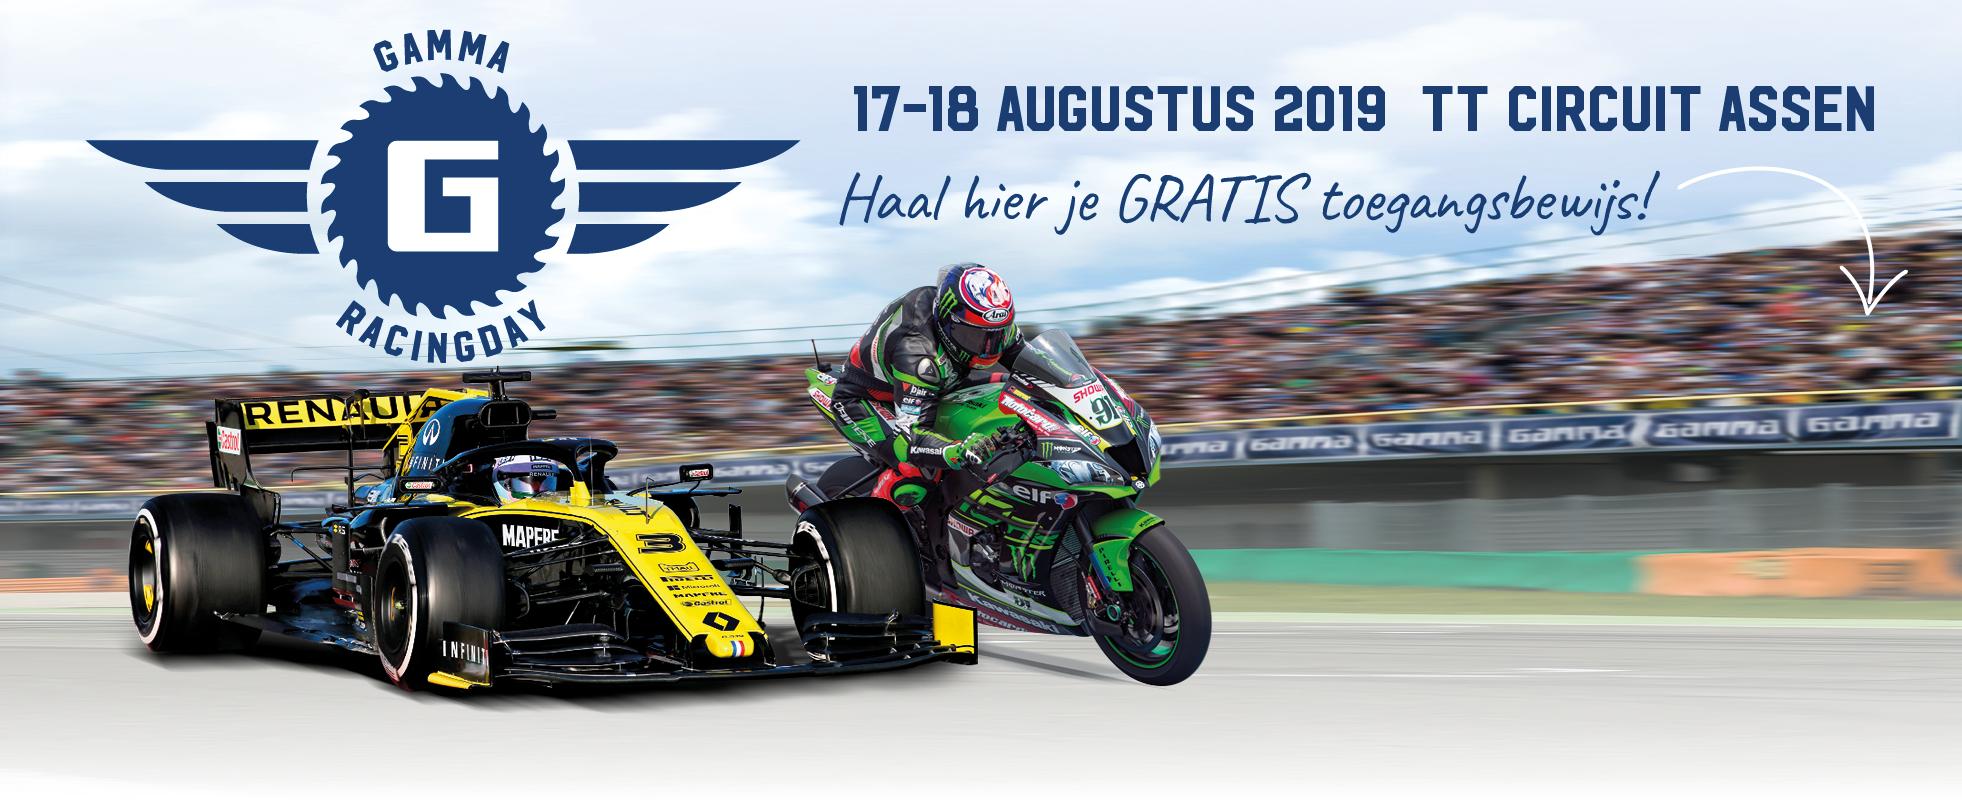 Gratis tickets Gamma racingdays TT circuit Assen @ Gamma